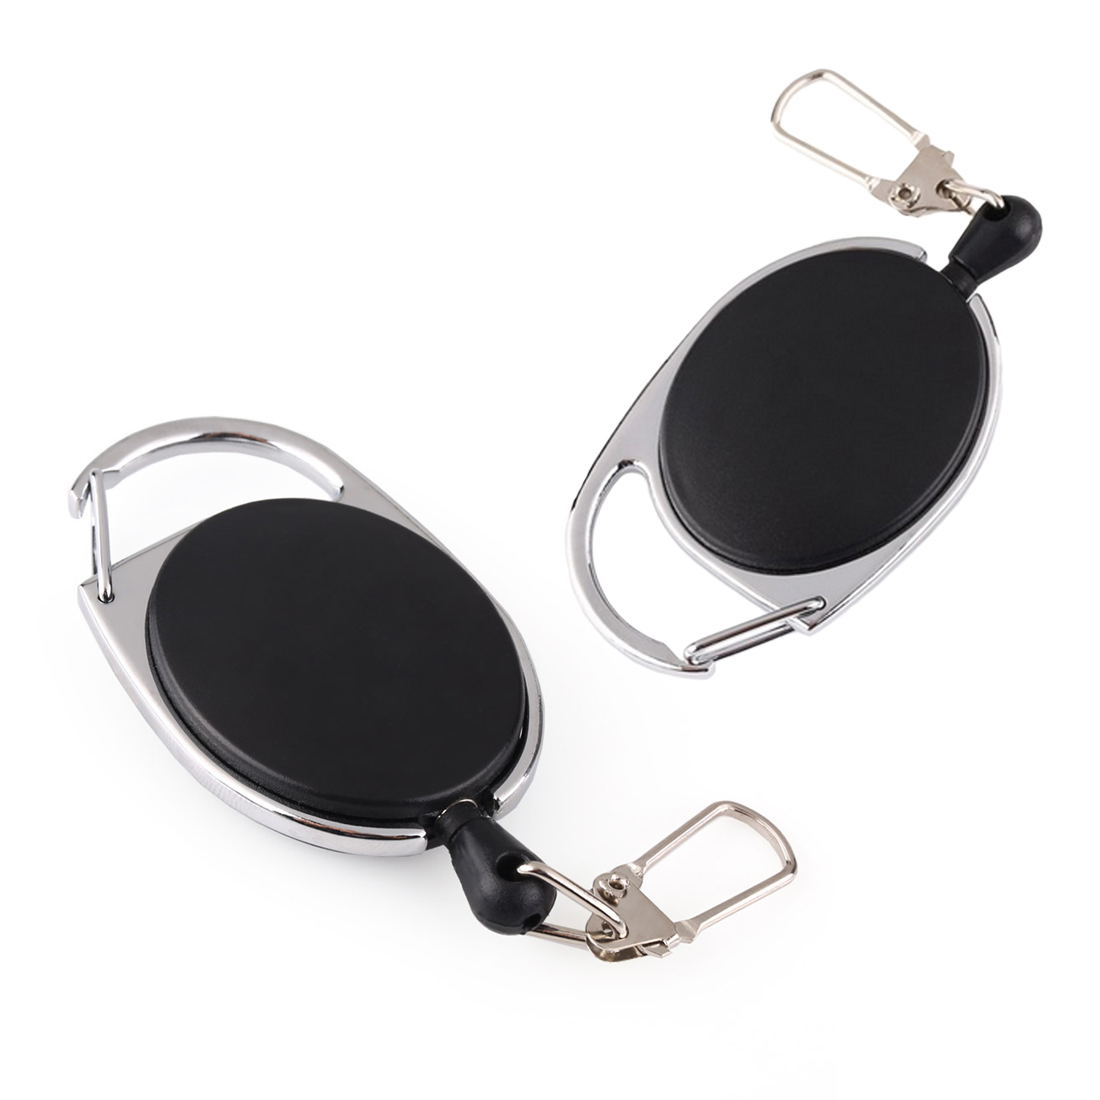 1PC Portable Retractable Wire Rope Key Burglar Keychain Edc Tactical Keyring